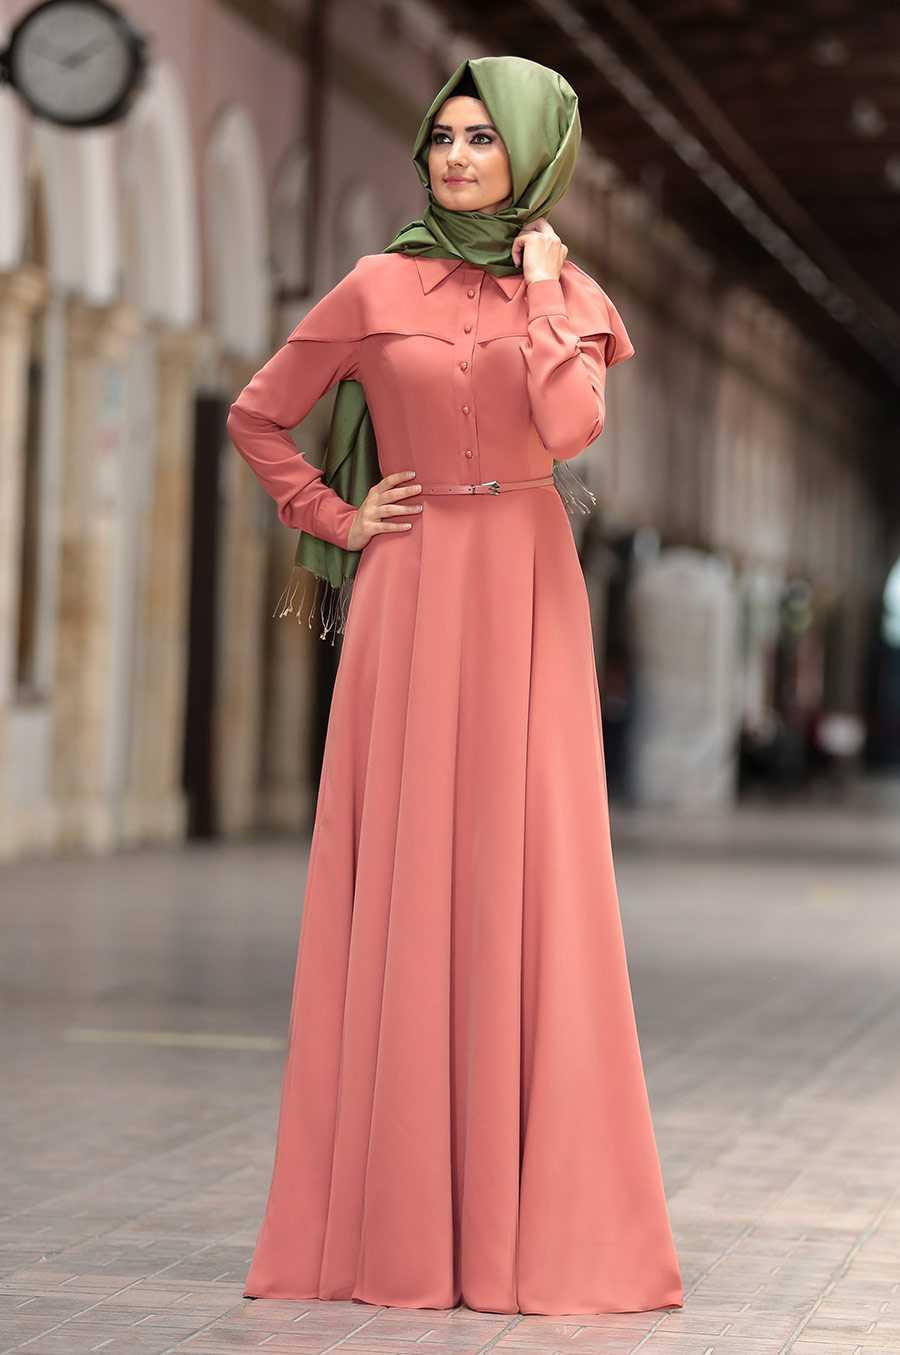 Al Marah Tesettür Tuana Elbise Modelleri